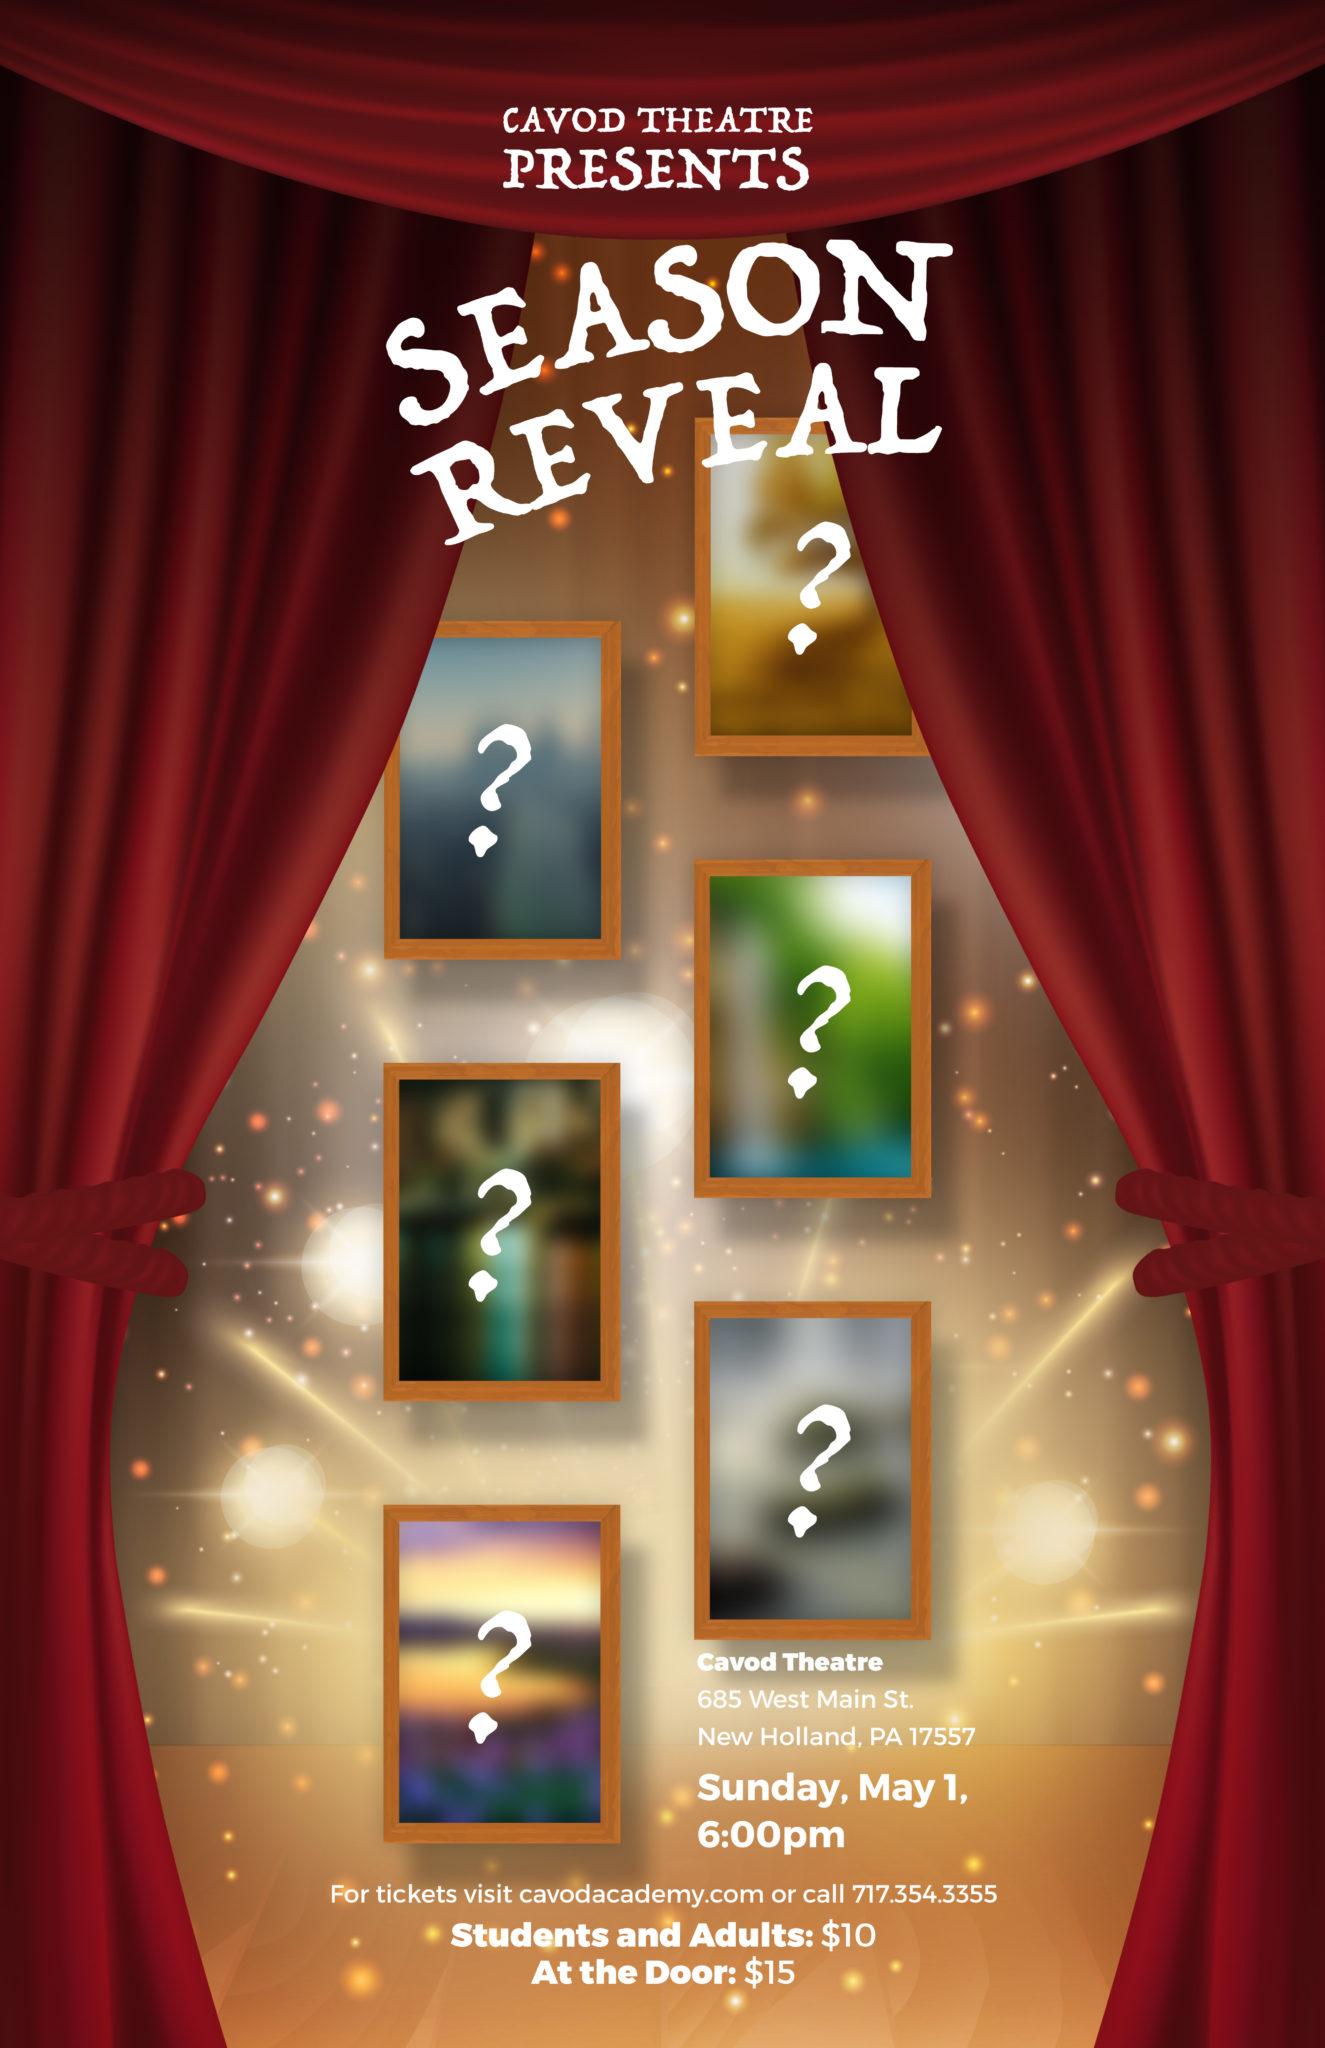 Cavod Theatre 2016/2017 Season Reveal Poster